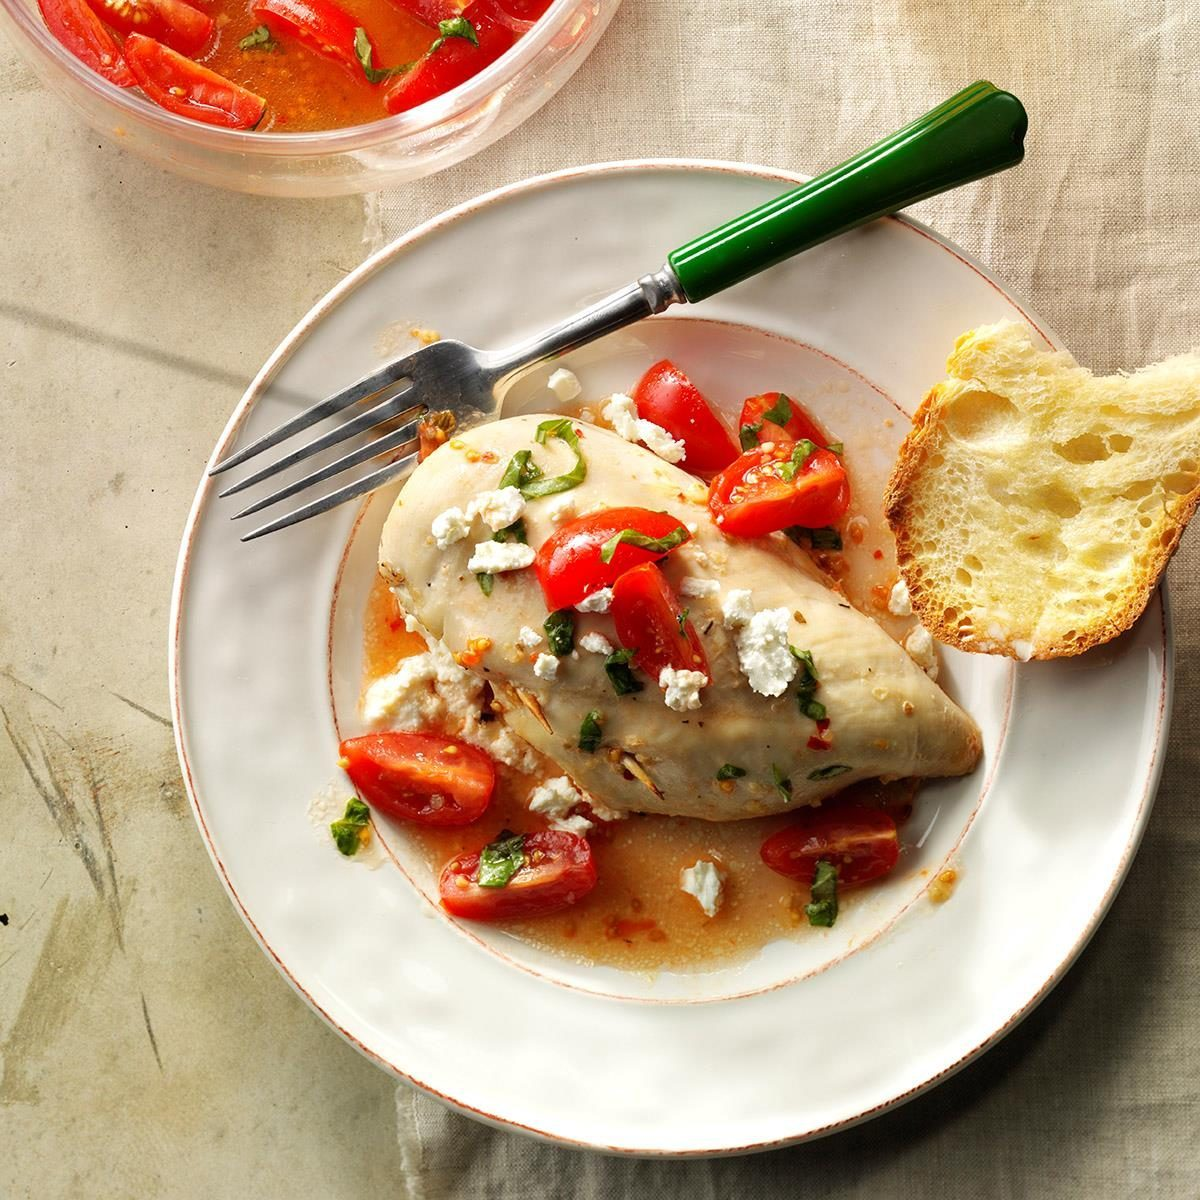 Inspired by: Olive Garden's Grilled Chicken Margherita